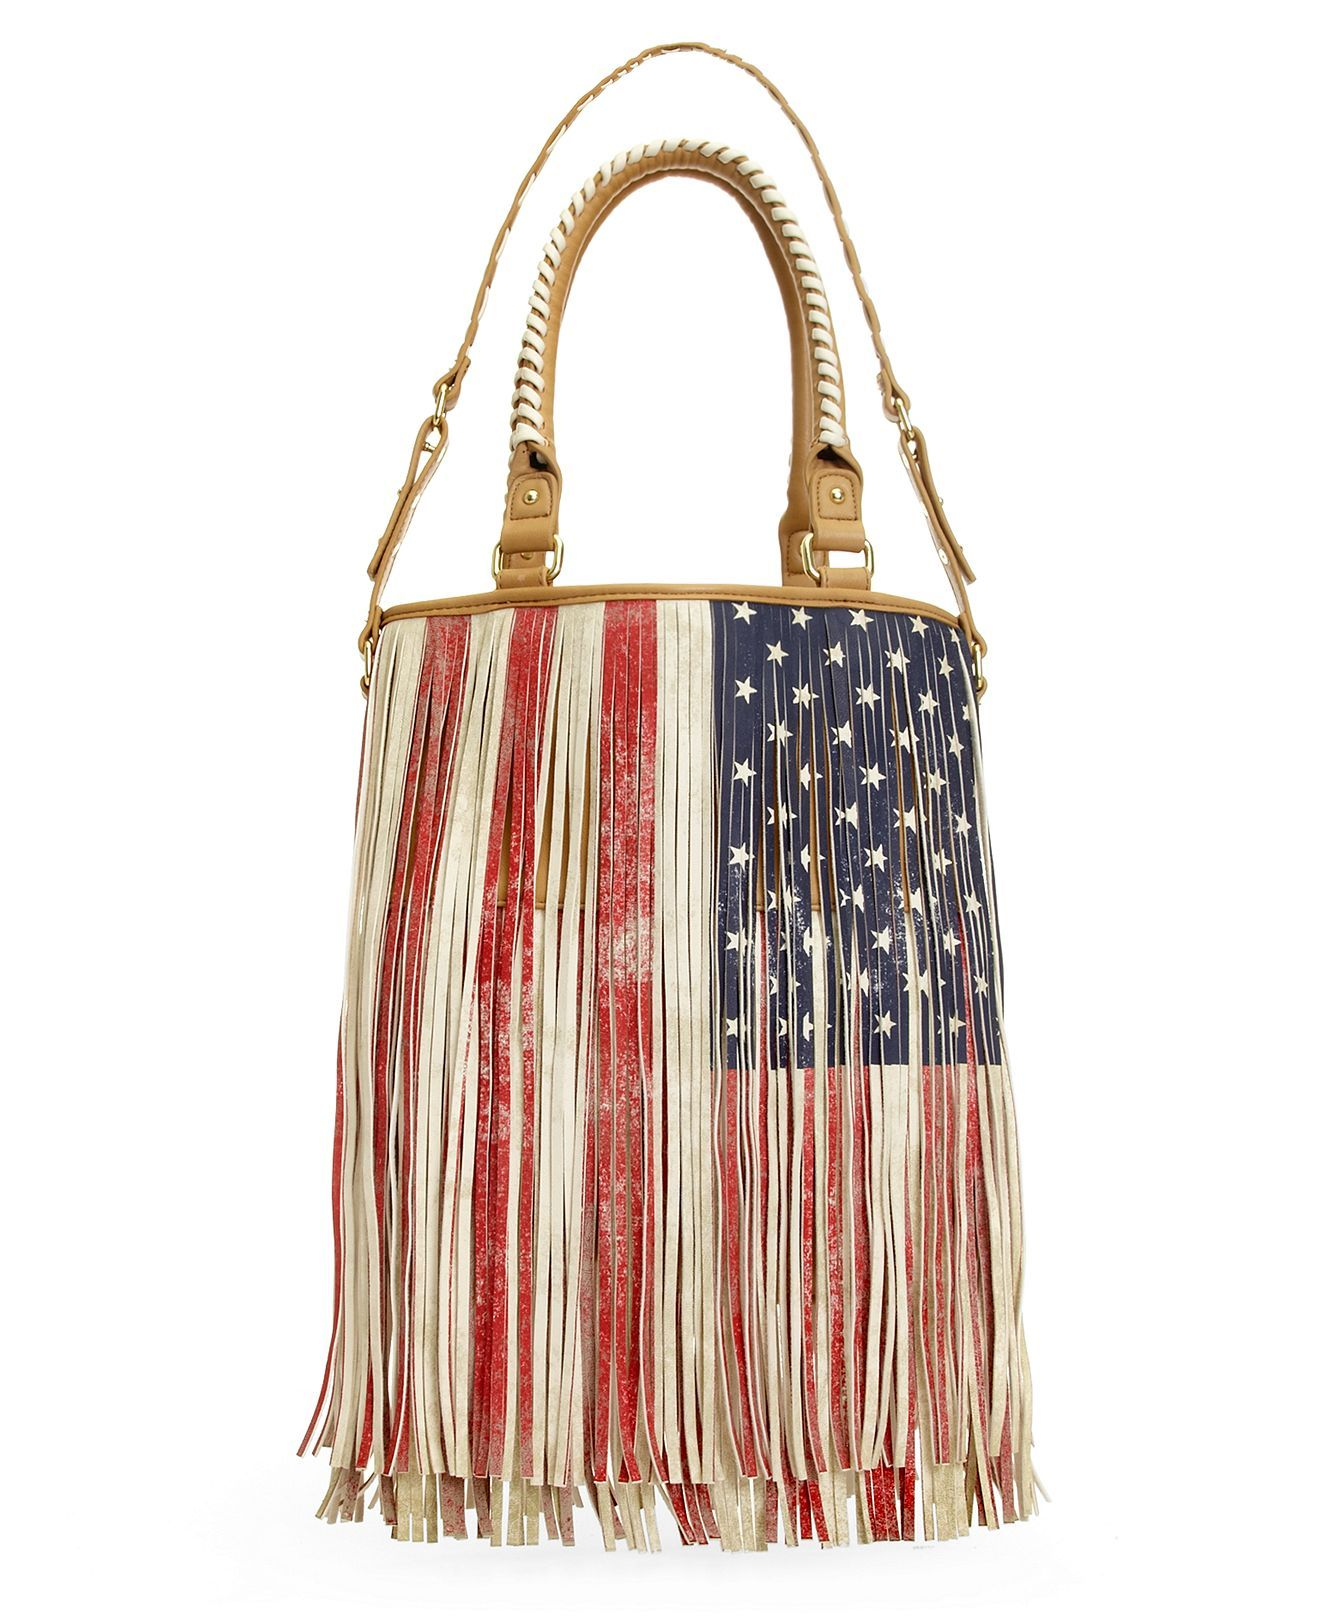 5498e8ac3370 MORE THAN ANYTHINGGGGGGGG Steve Madden Handbag